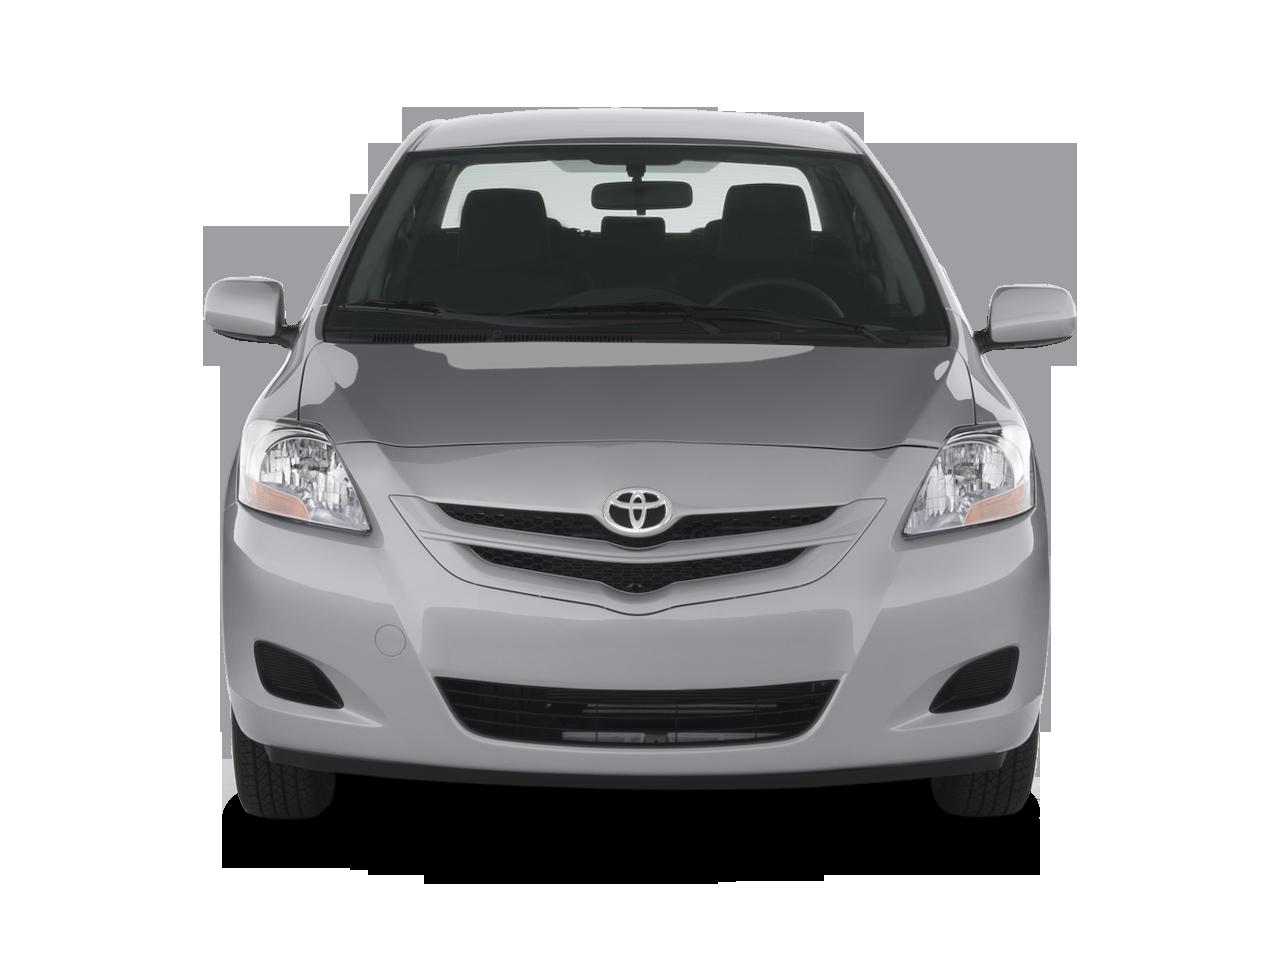 2008 Toyota Yaris - Toyota Compact Sedan Review ...